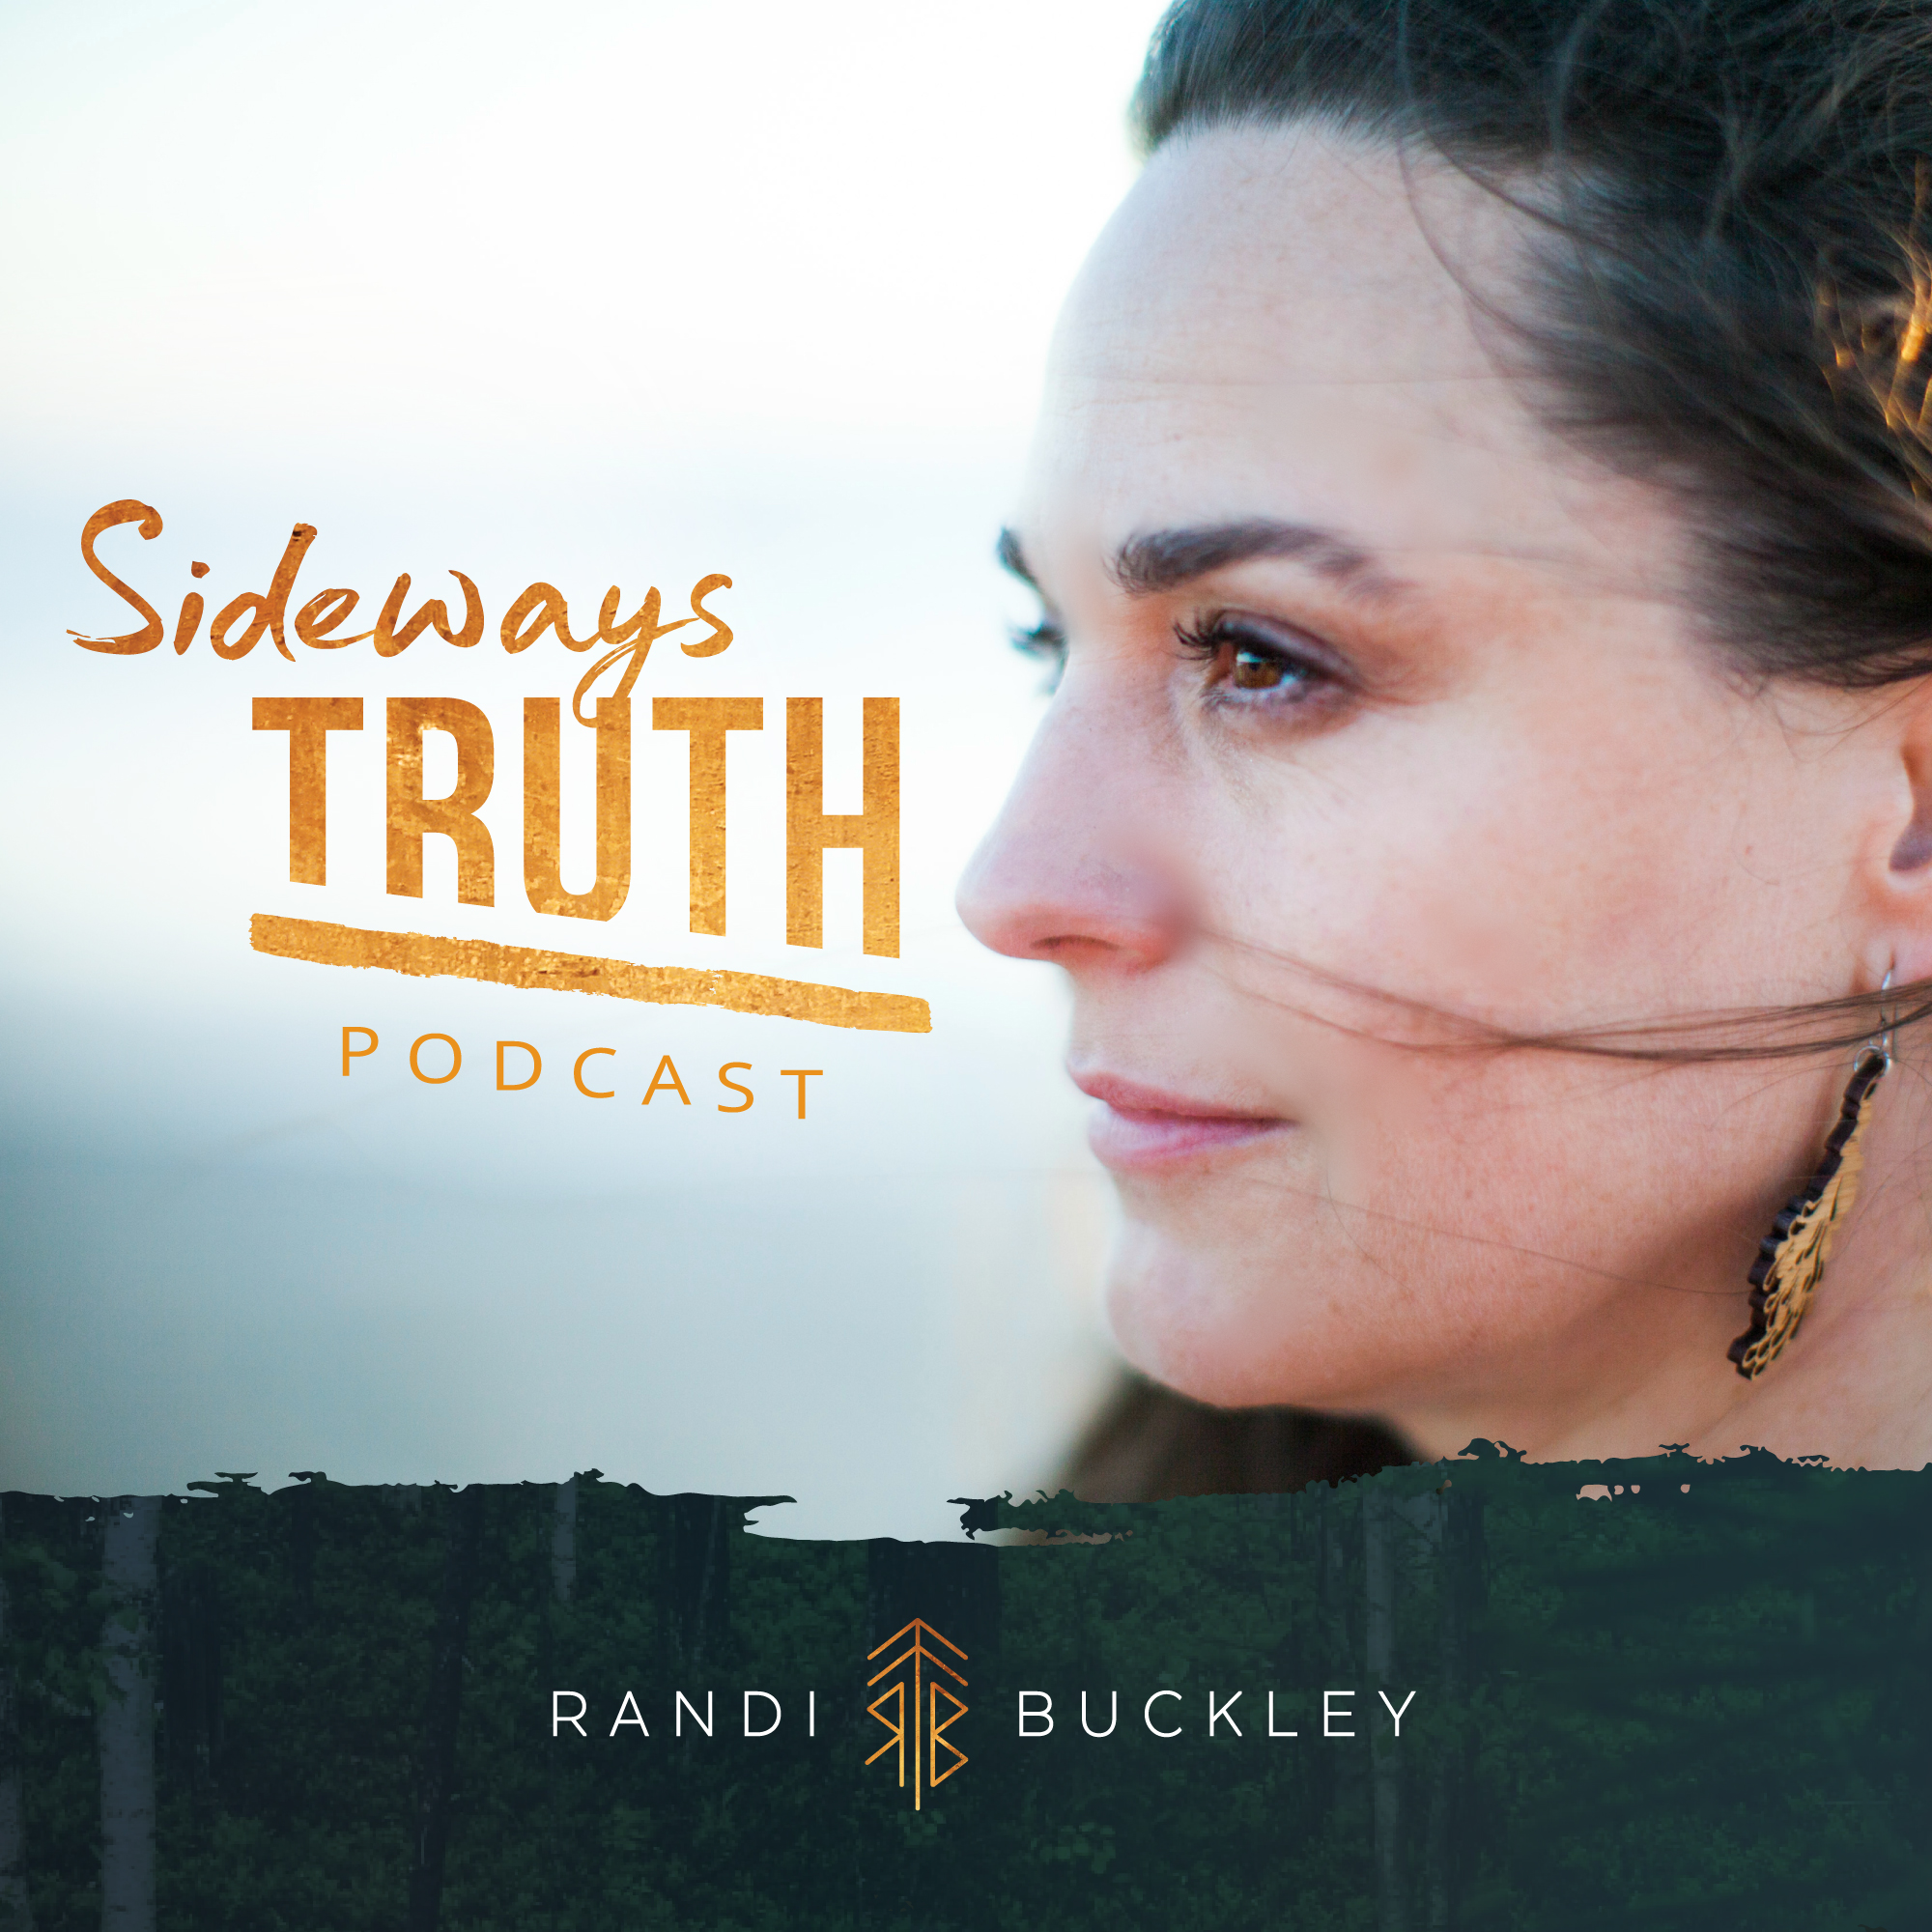 Sideways-Truth-Podcast-Artwork-REVISED (1).jpg